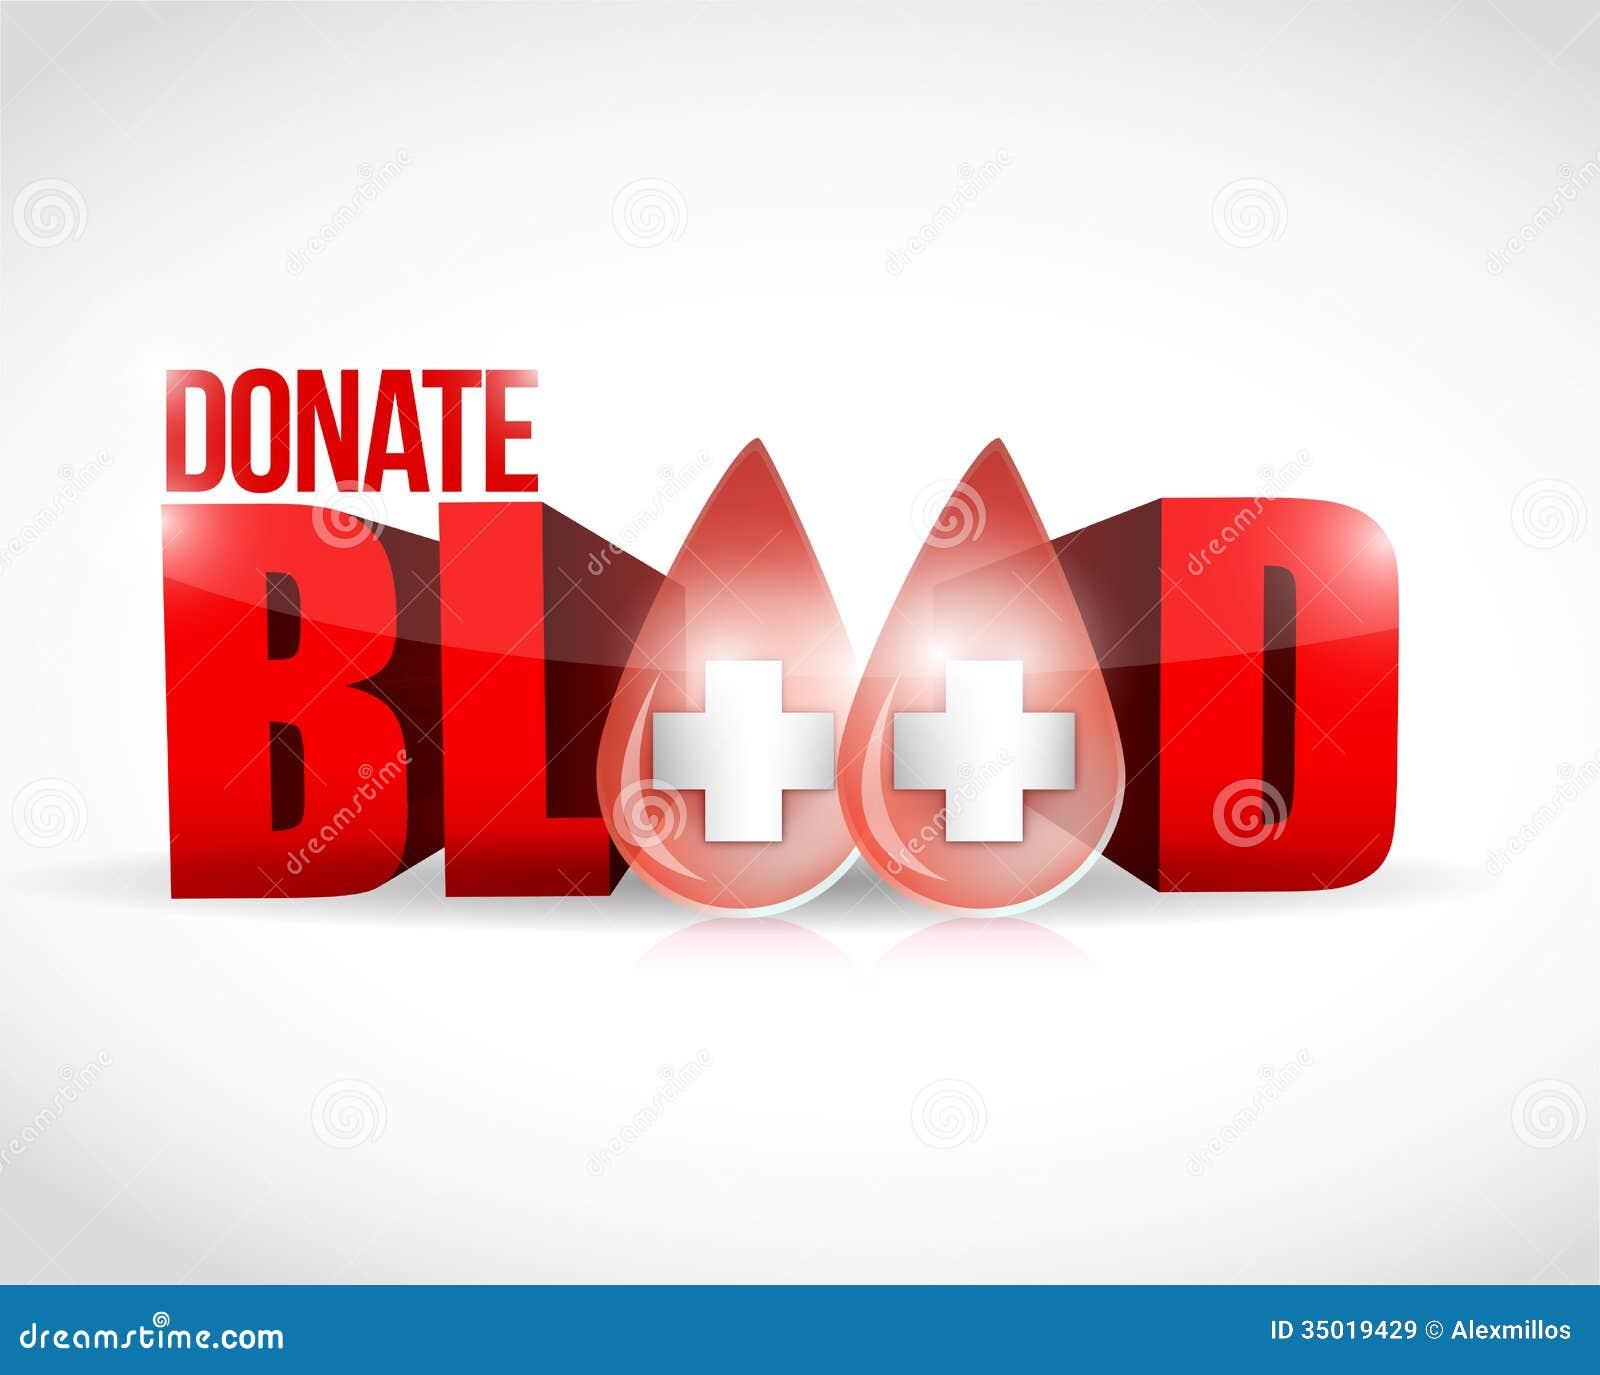 Donate blood illustration design royalty free stock images image 35019429 for Blood bank planning and designing